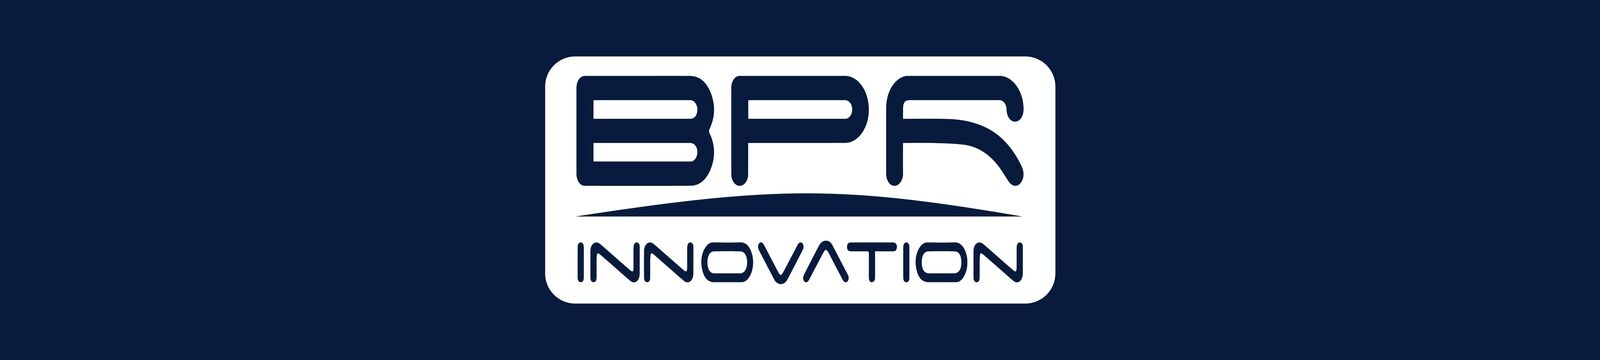 BPR INNOVATION